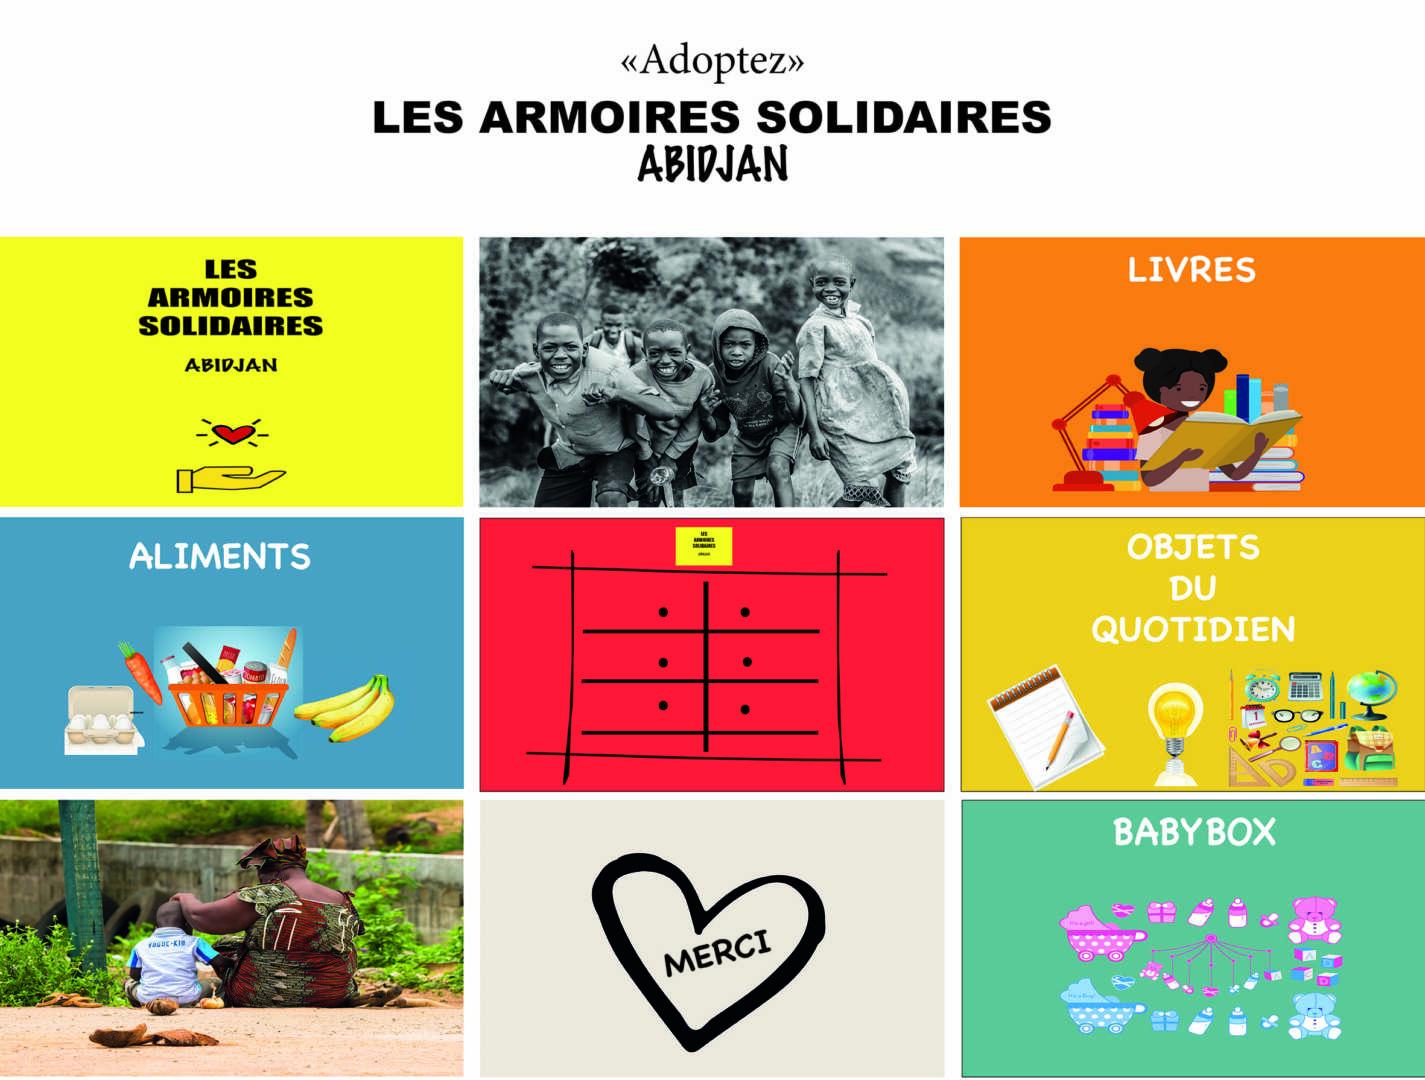 Les Armoires Solidaires Abidjan